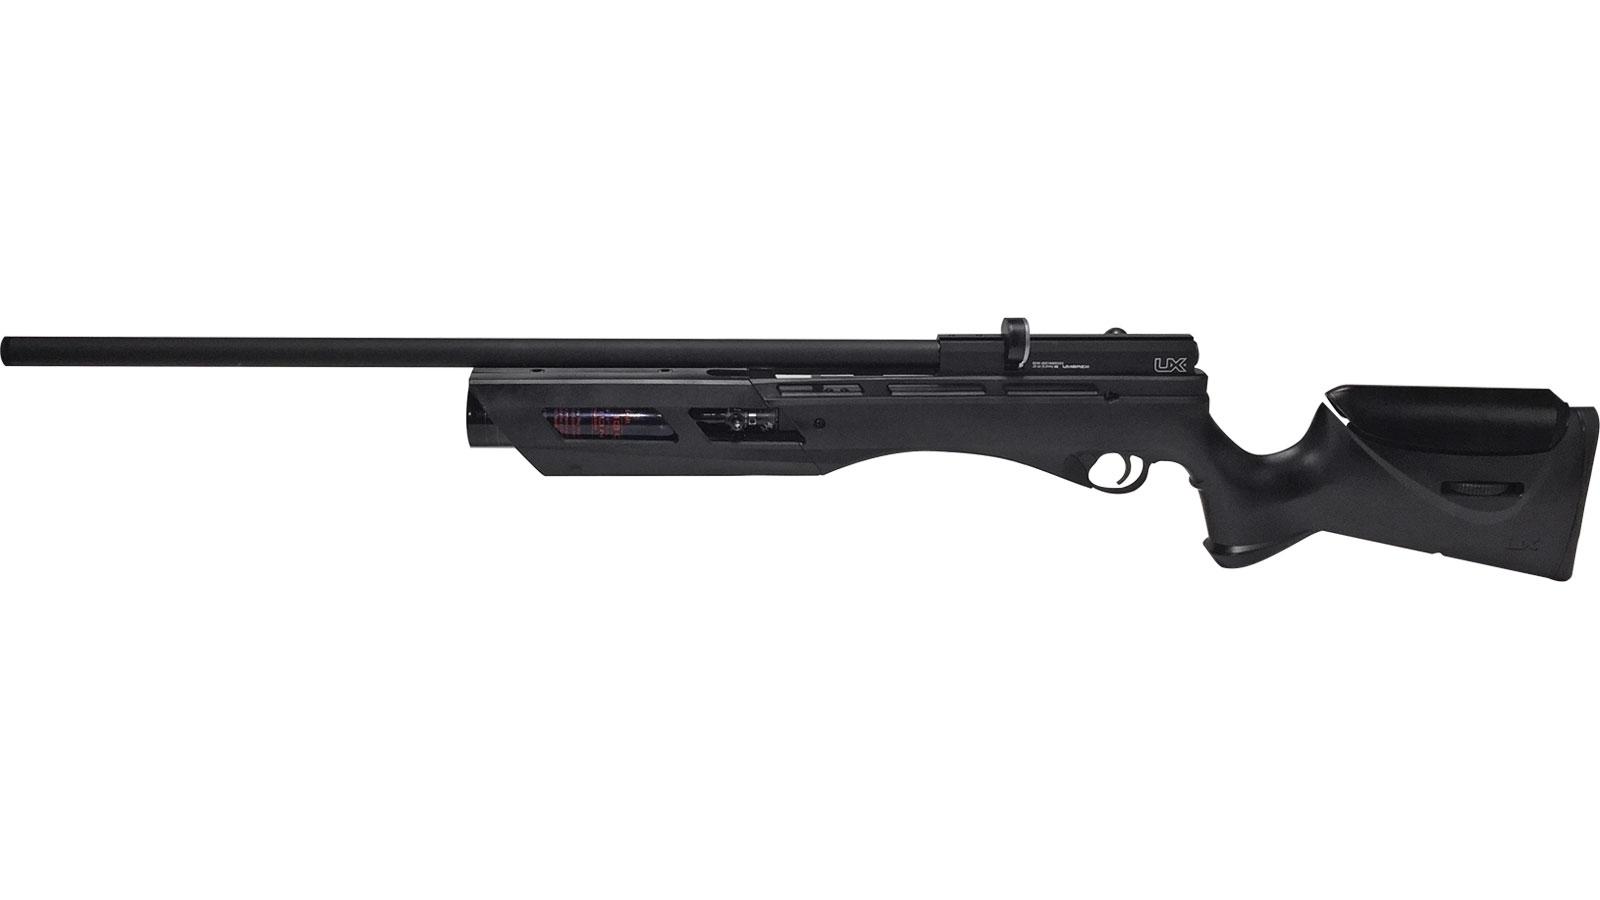 Umarex Gauntlet PCP Air Rifle, Bolt Action, .177 Caliber, 28.5 quot Barrel, 10 Rounds